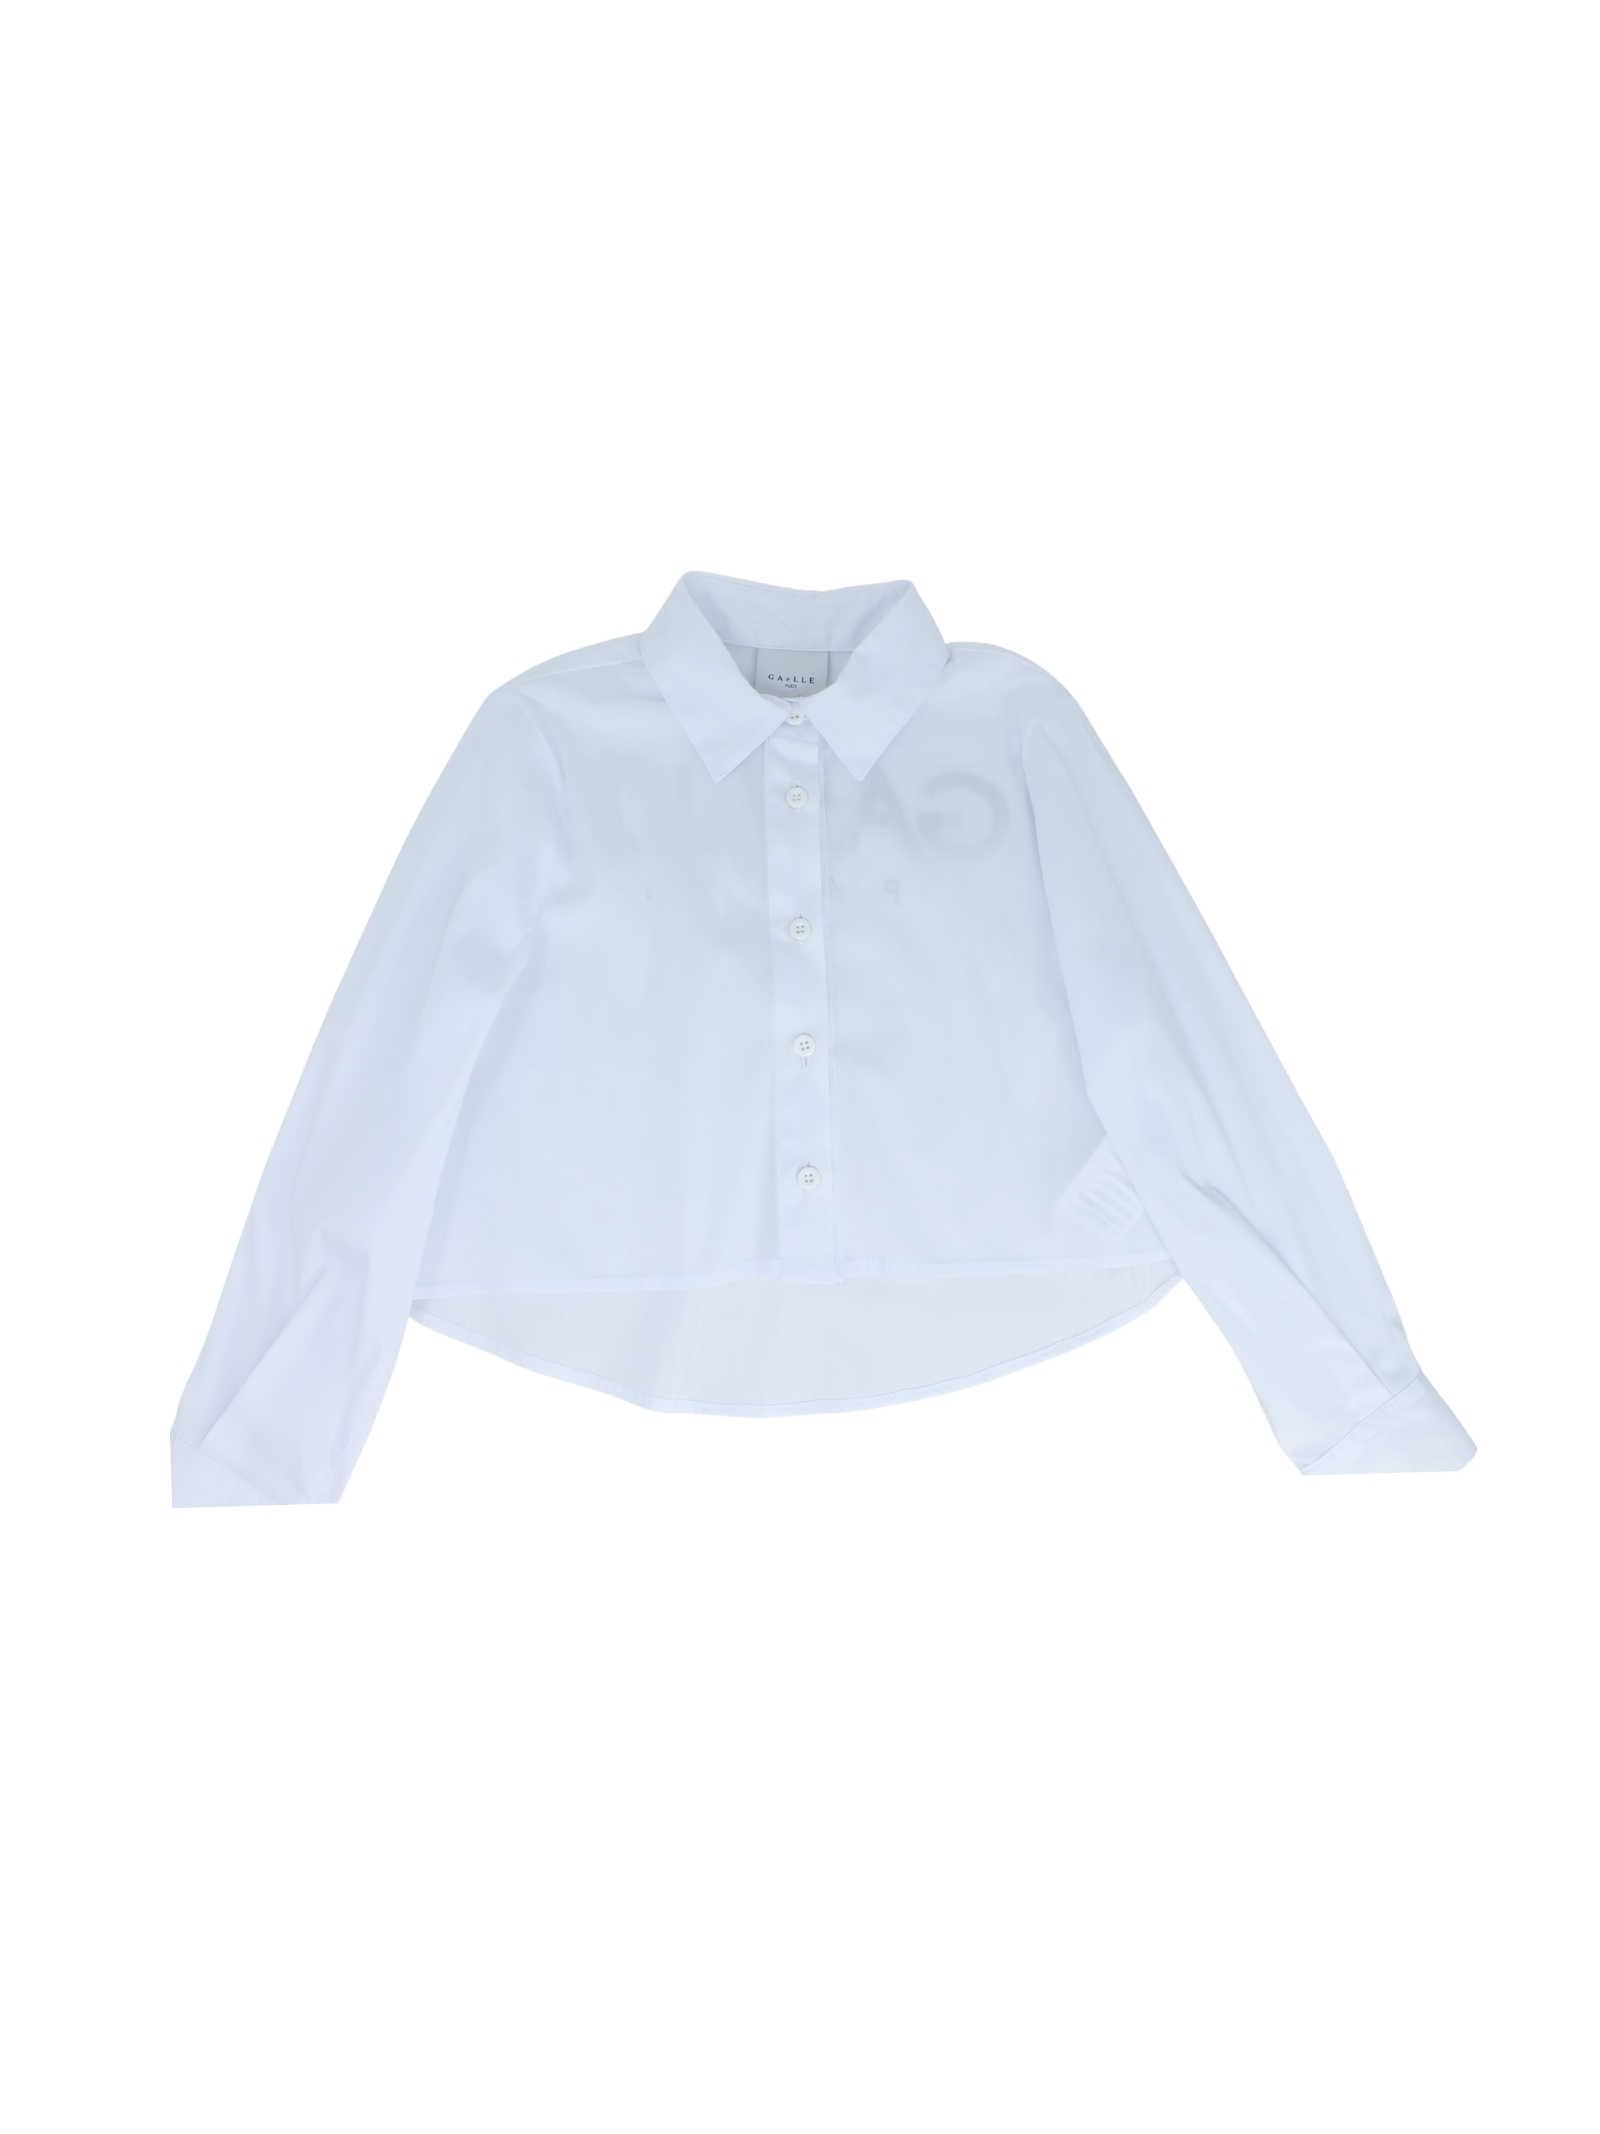 Camicia Swarovski Bambina GAËLLE PARIS KIDS | Camicie | 2746C0368WHITE